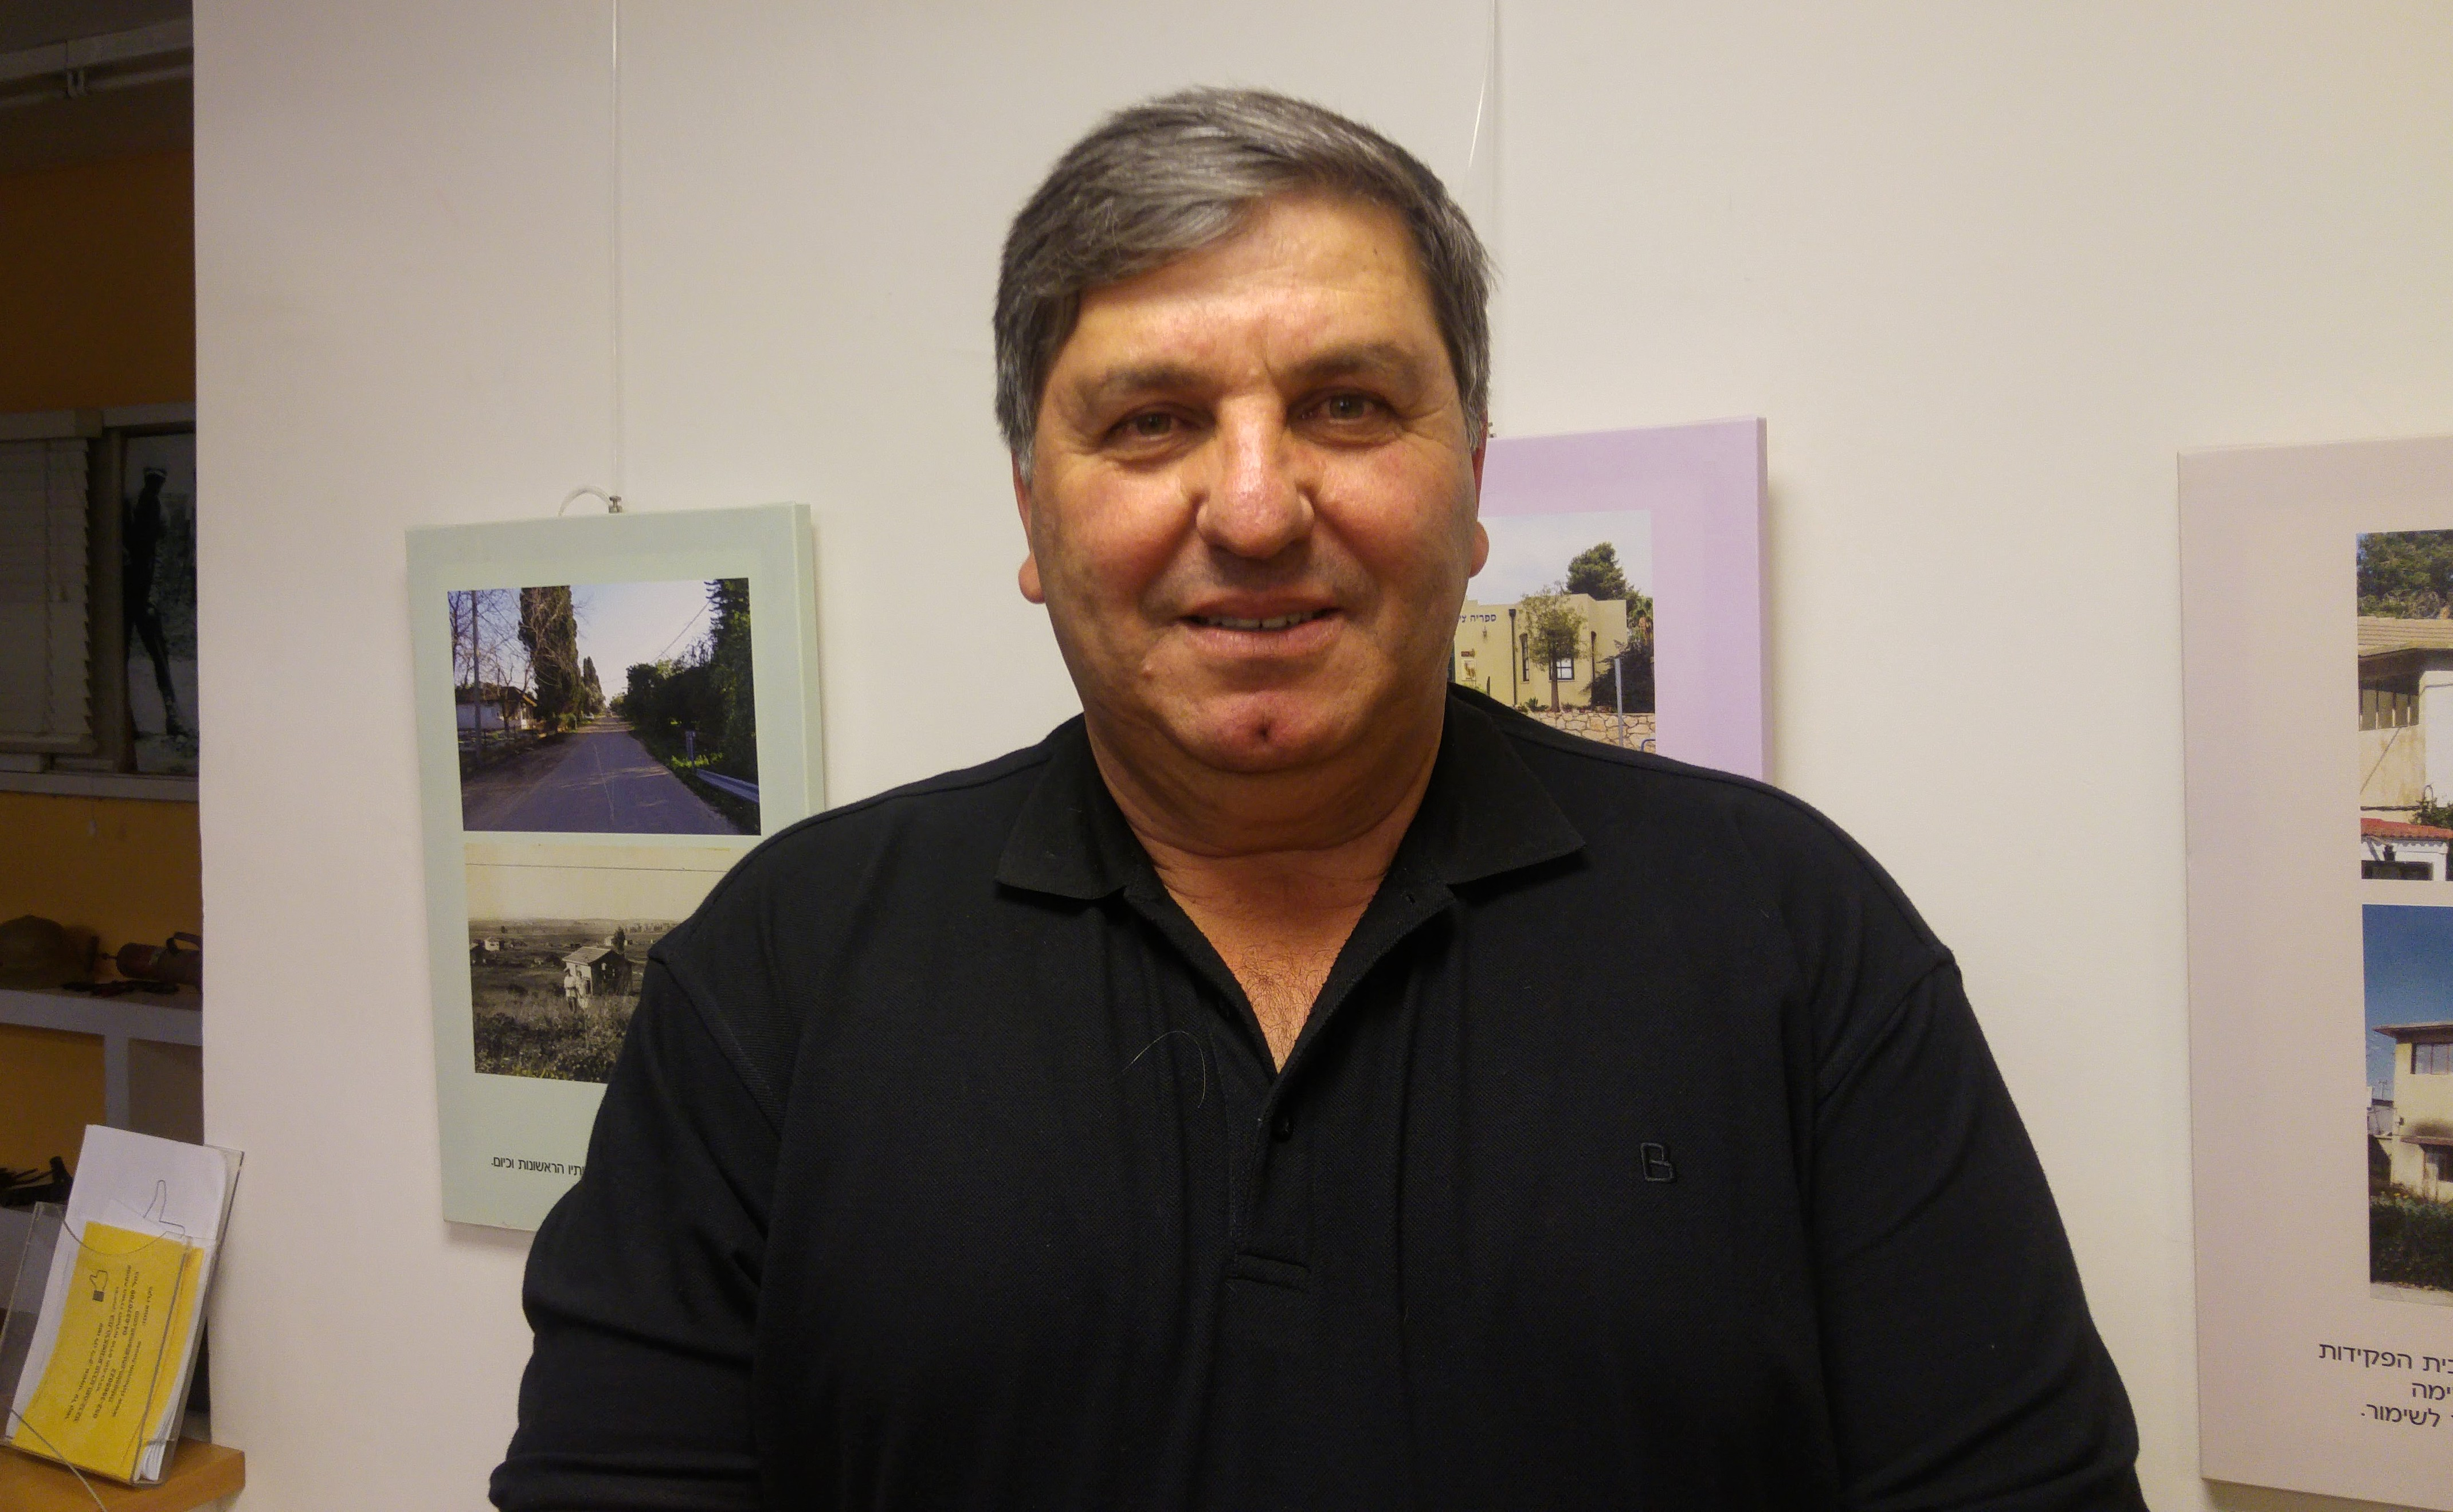 Danny Atar - Wikipedia